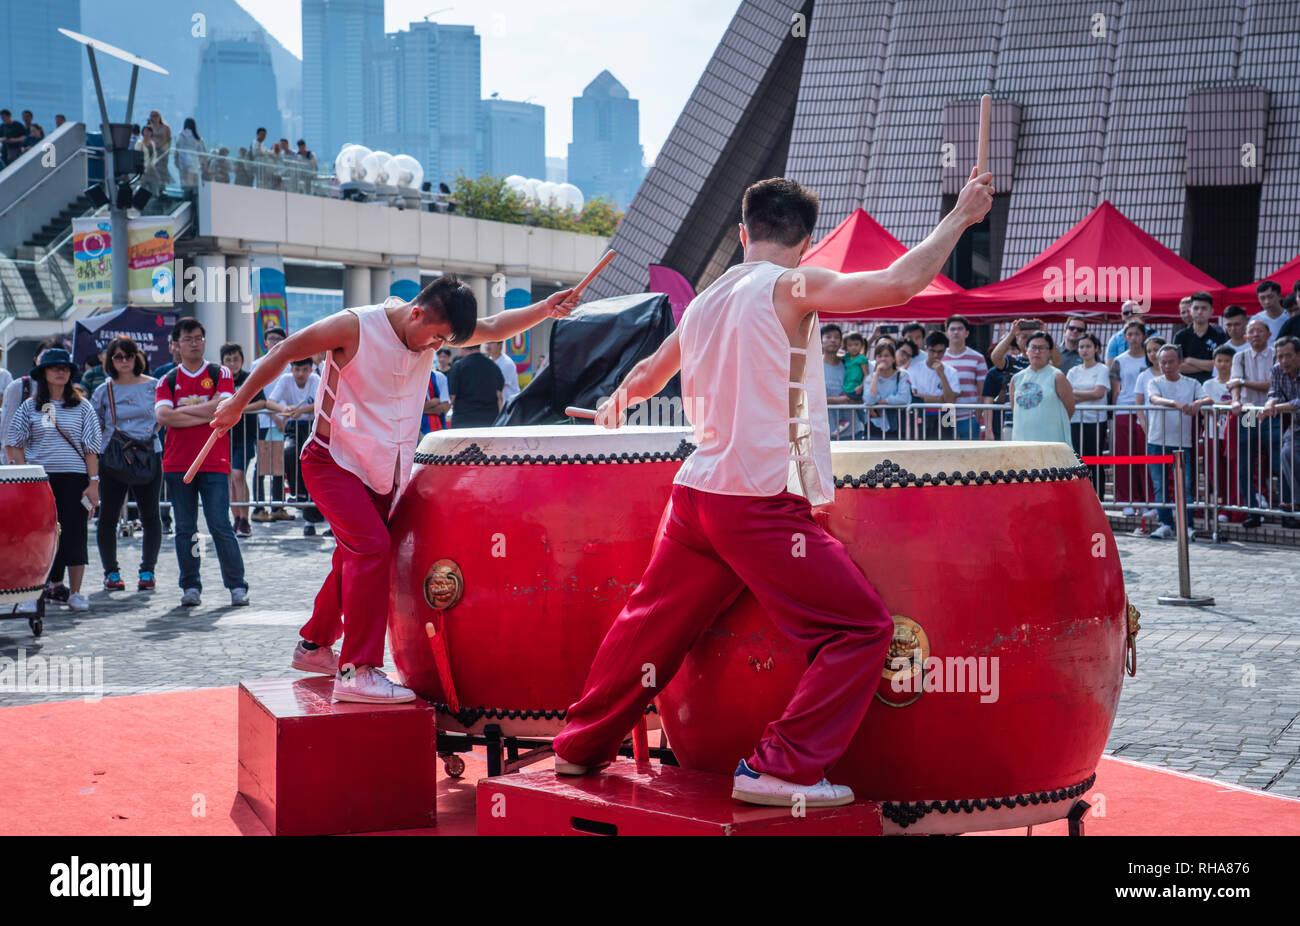 La sinergia de Hong Kong 24 Tambor afuera de competencia en Kowloon, Hong Kong, China, Asia. Imagen De Stock